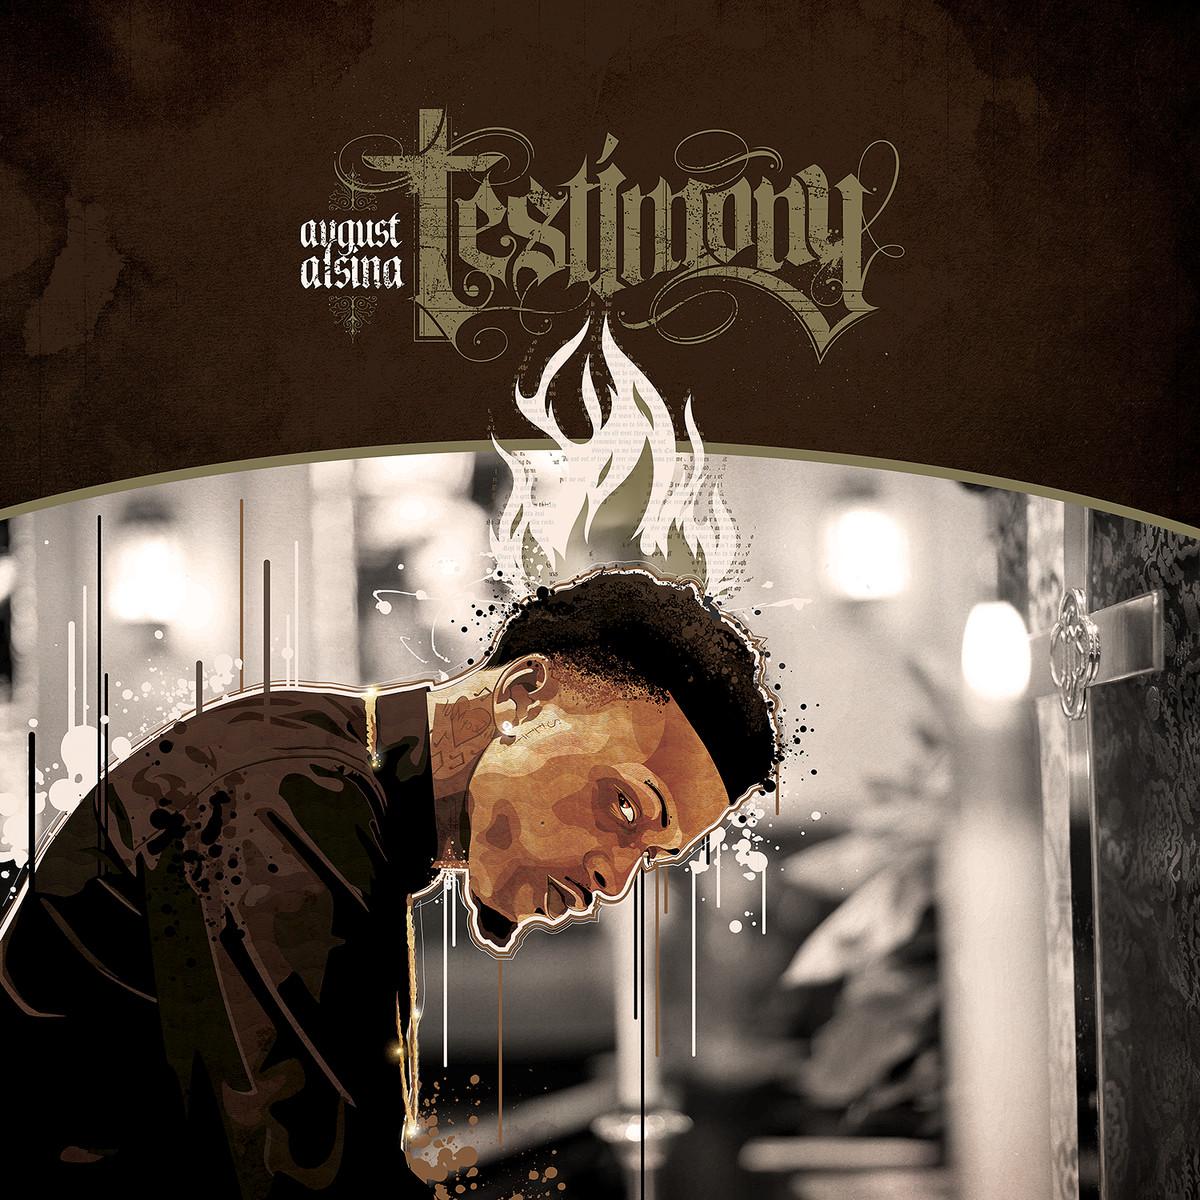 College the vinyl analysis august alsinas testimony is hip hop rbs happy medium altavistaventures Image collections